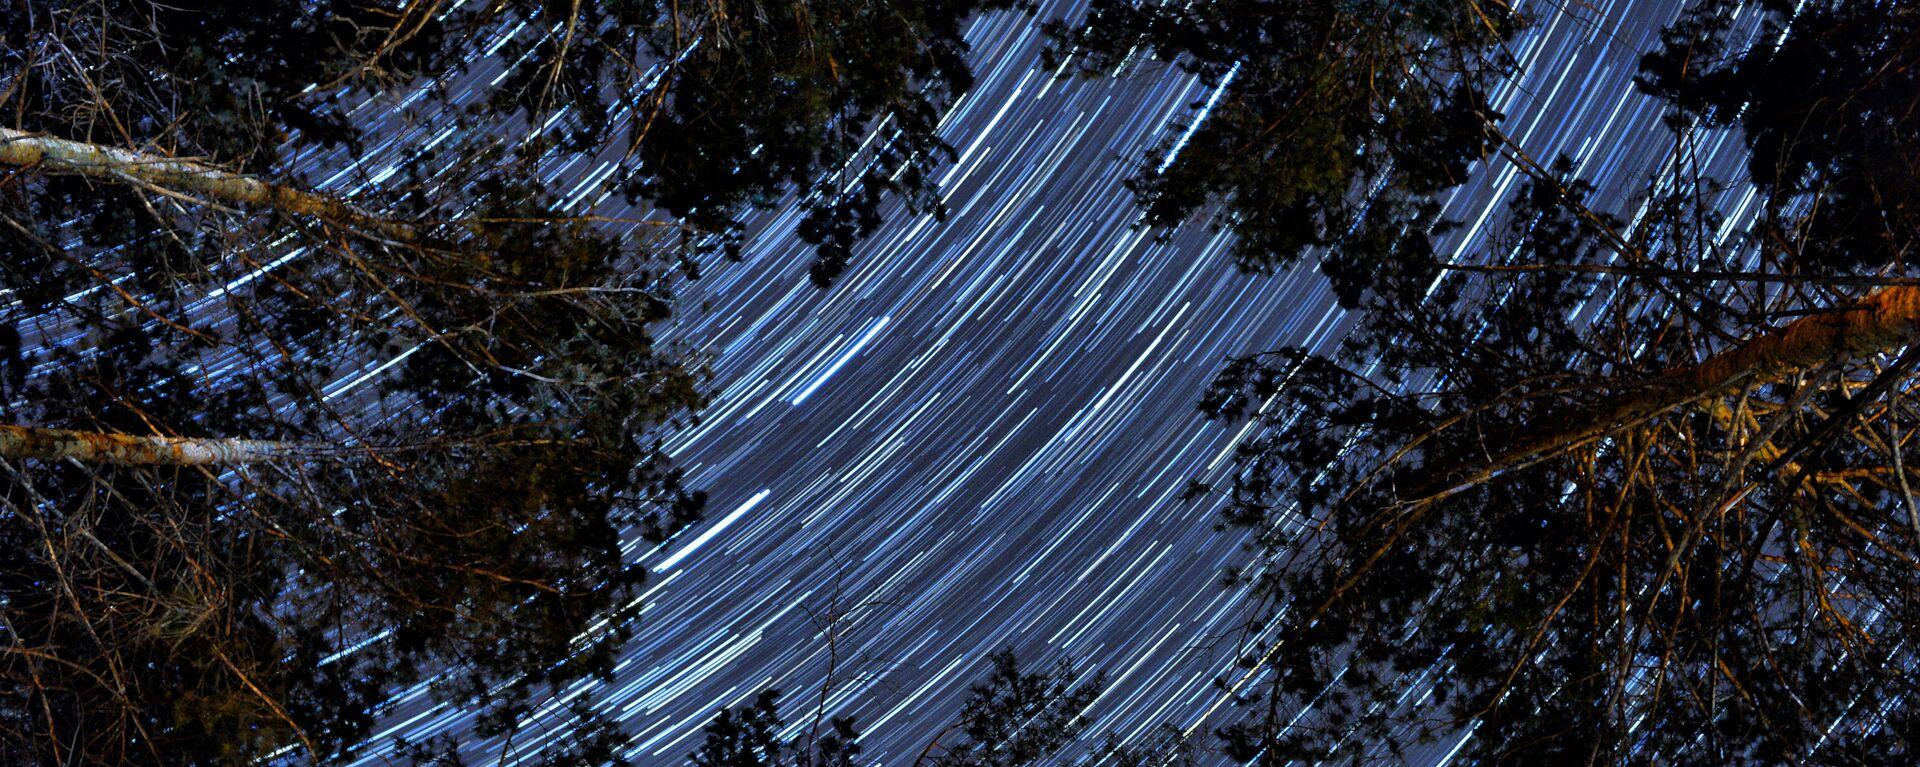 La volta celeste - Sputnik Italia, 1920, 28.05.2021